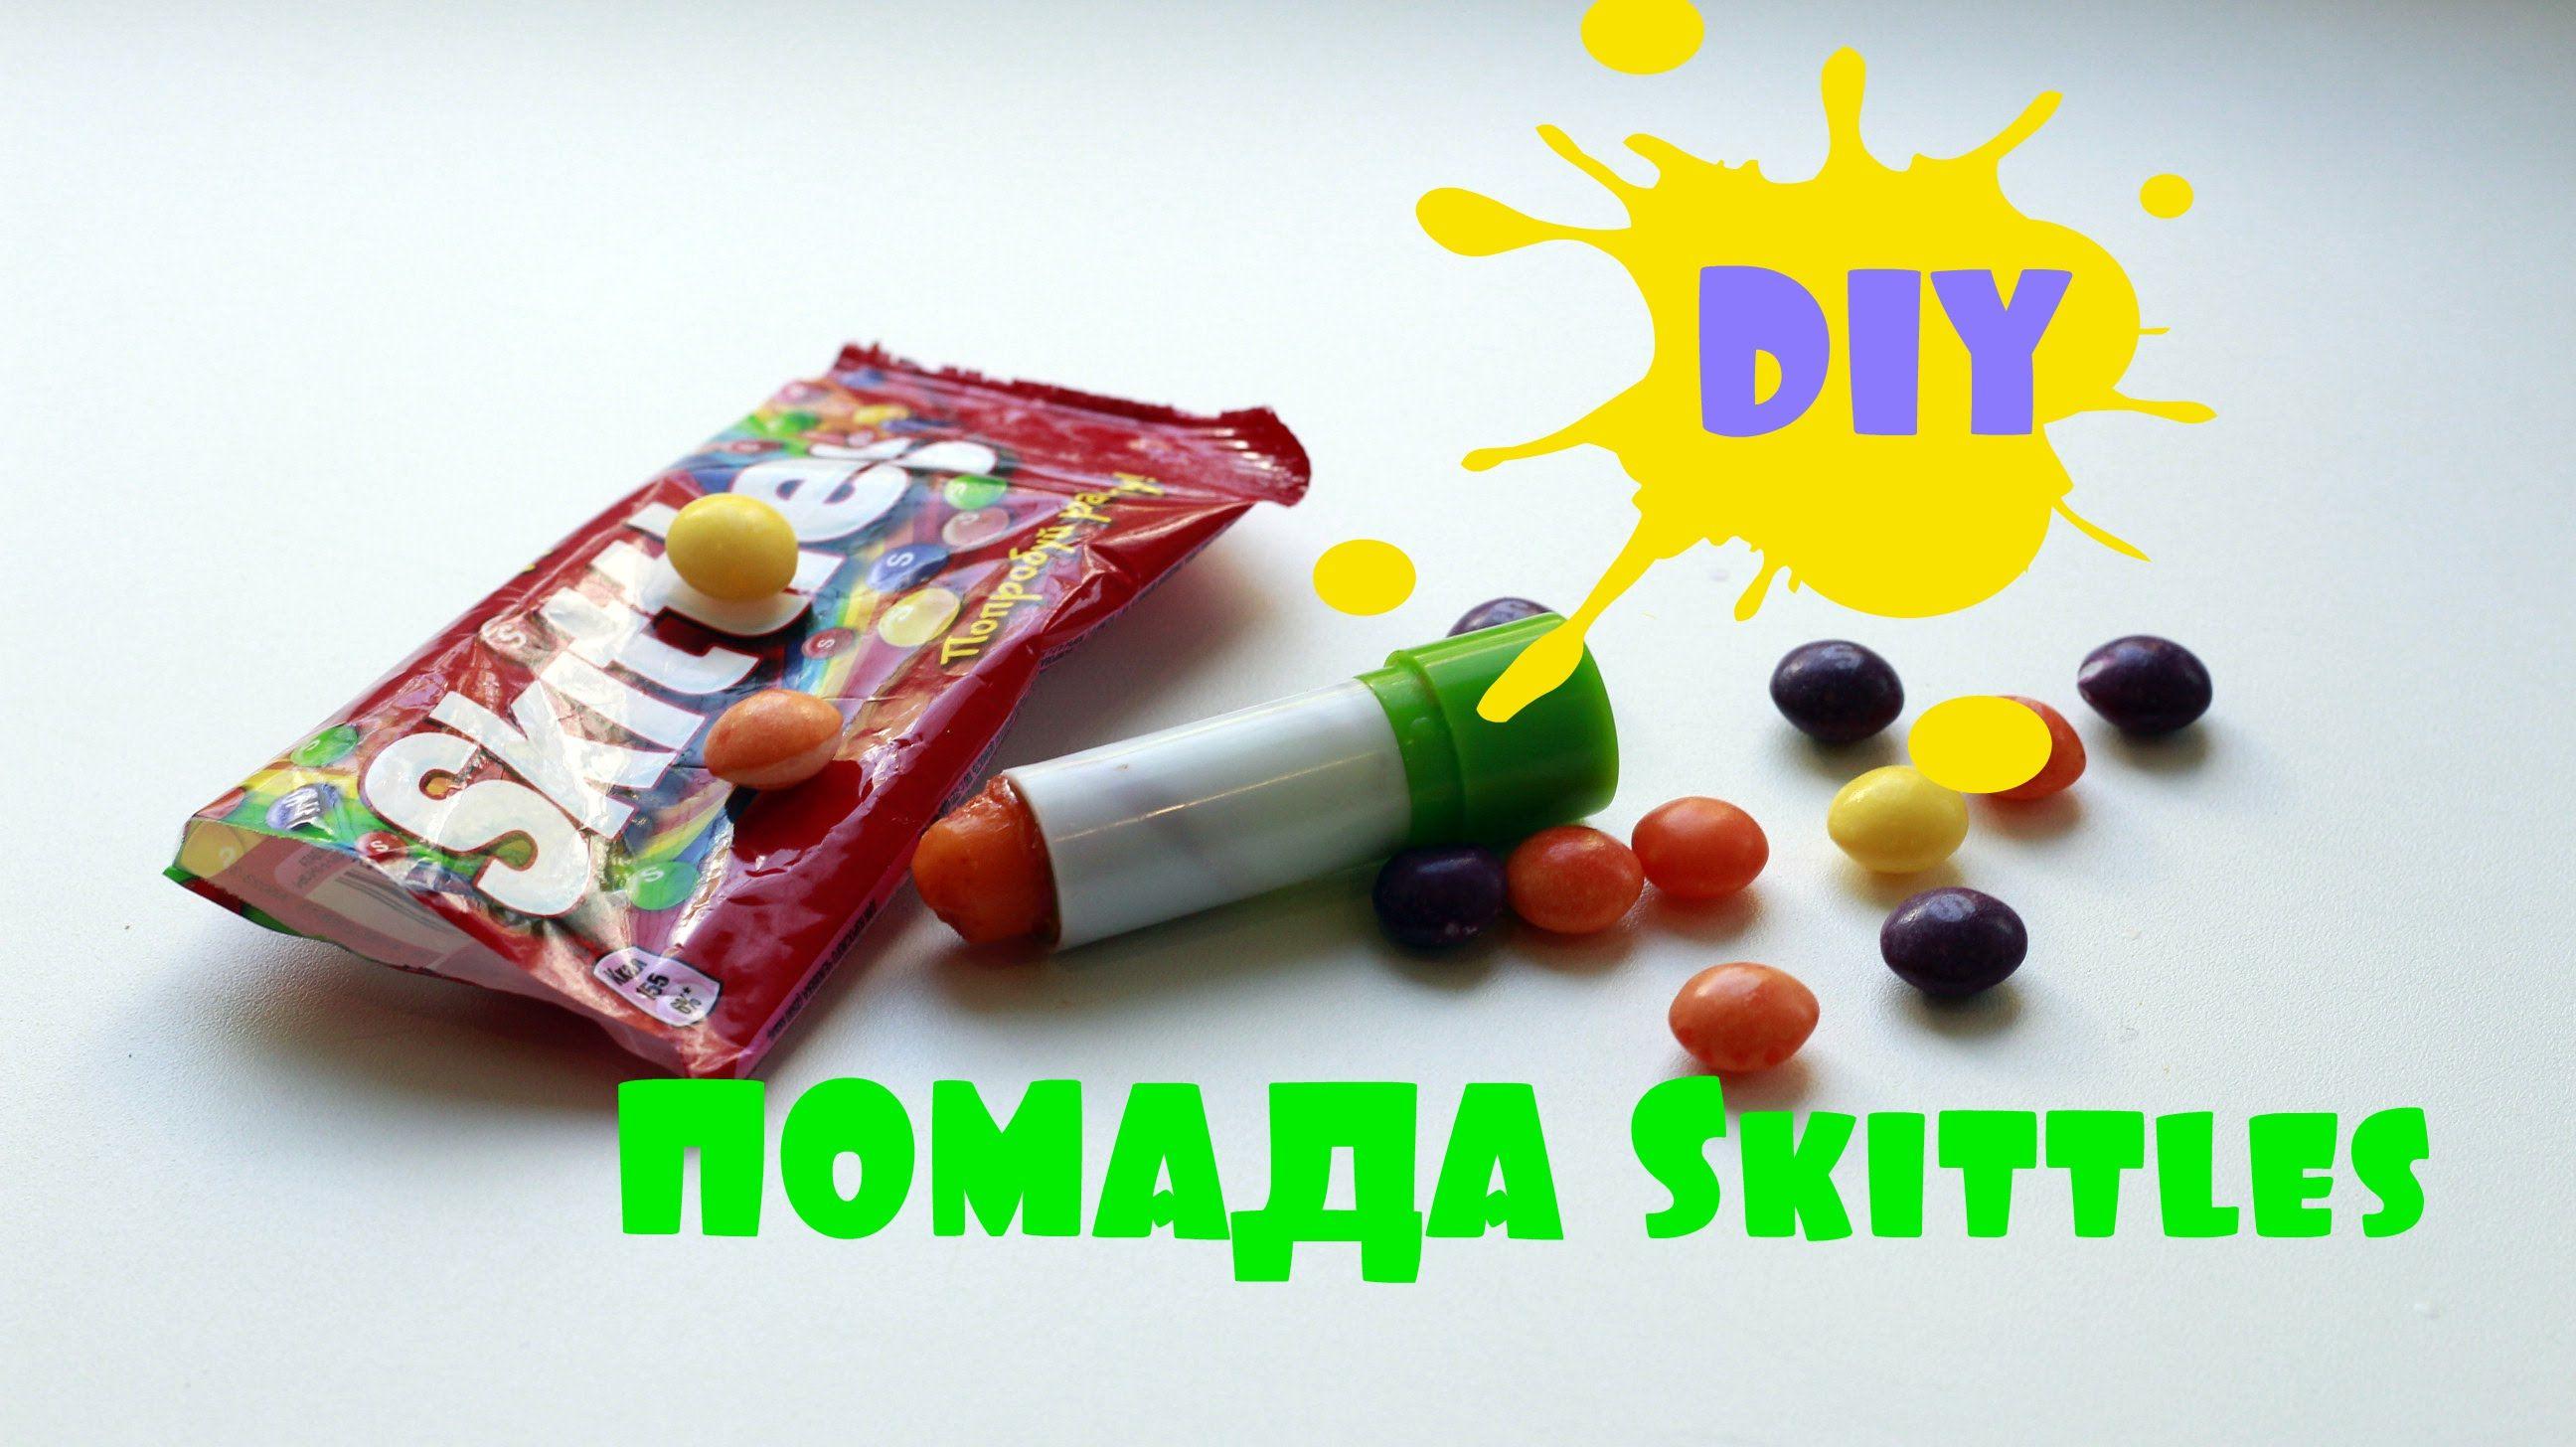 Diy 5 Skittlesdiy Lipstick Skittlesdiy Lip Balm